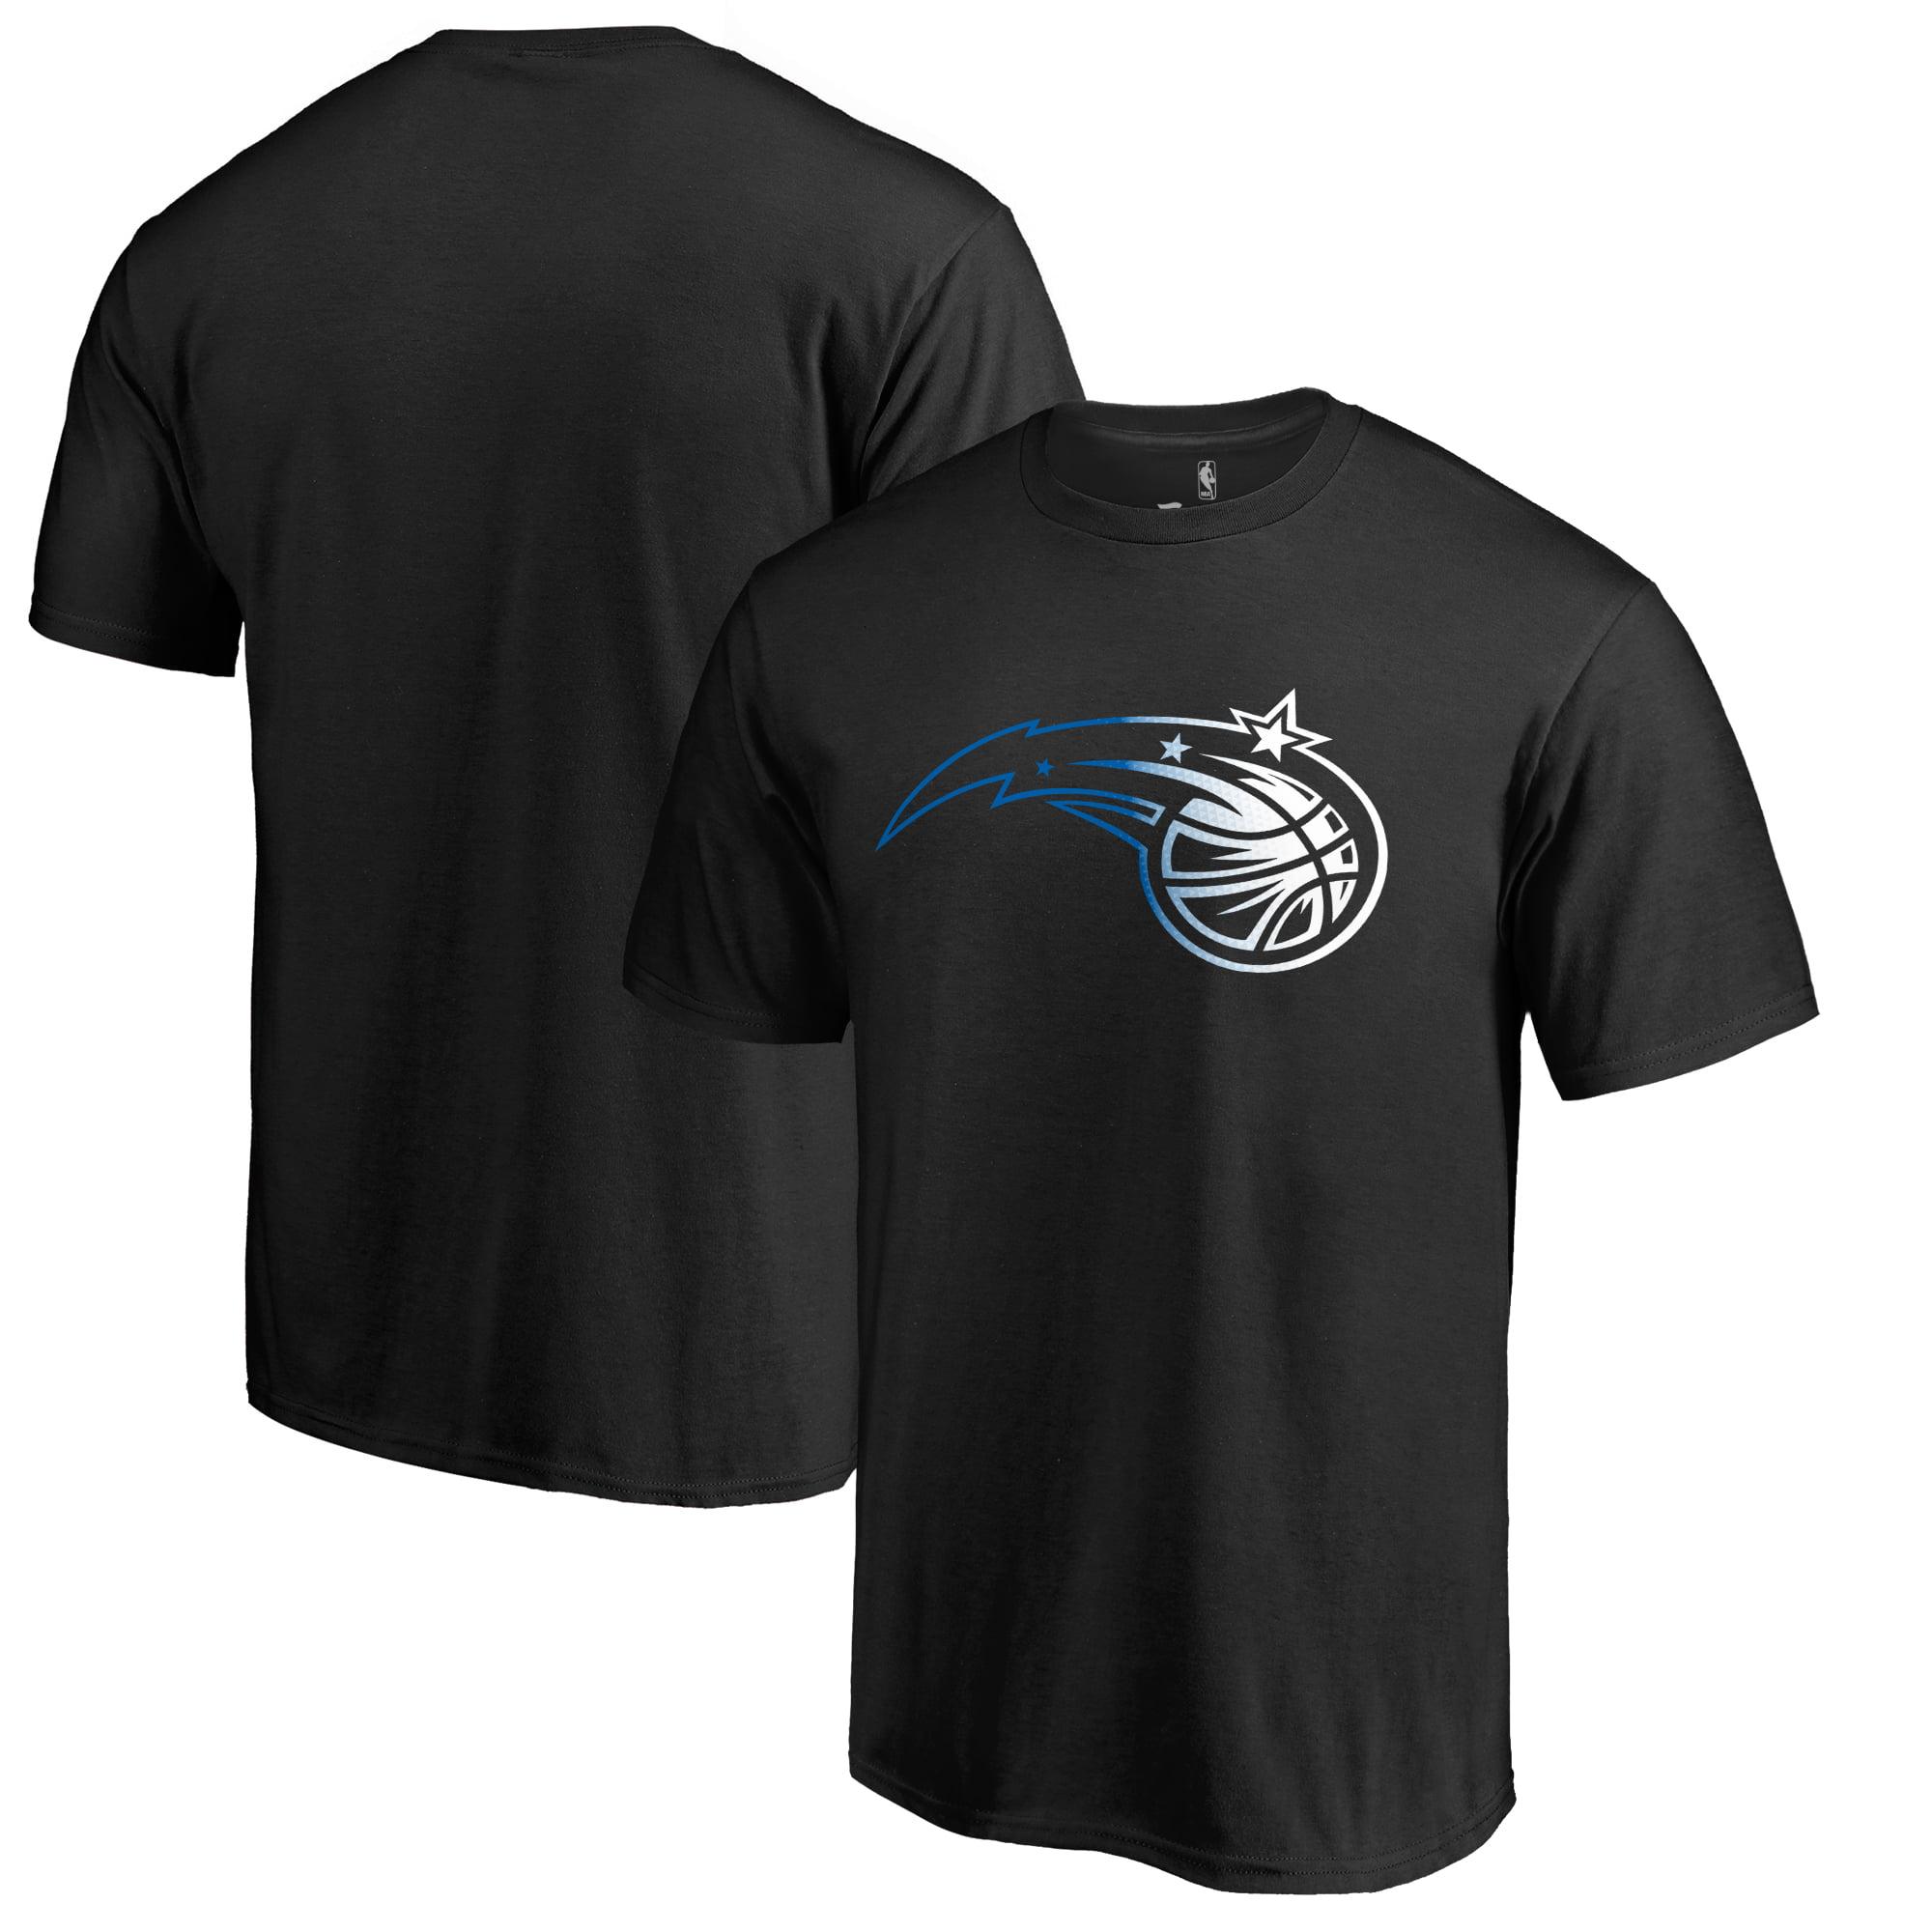 Orlando Magic Fanatics Branded Gradient Logo T-Shirt - Black